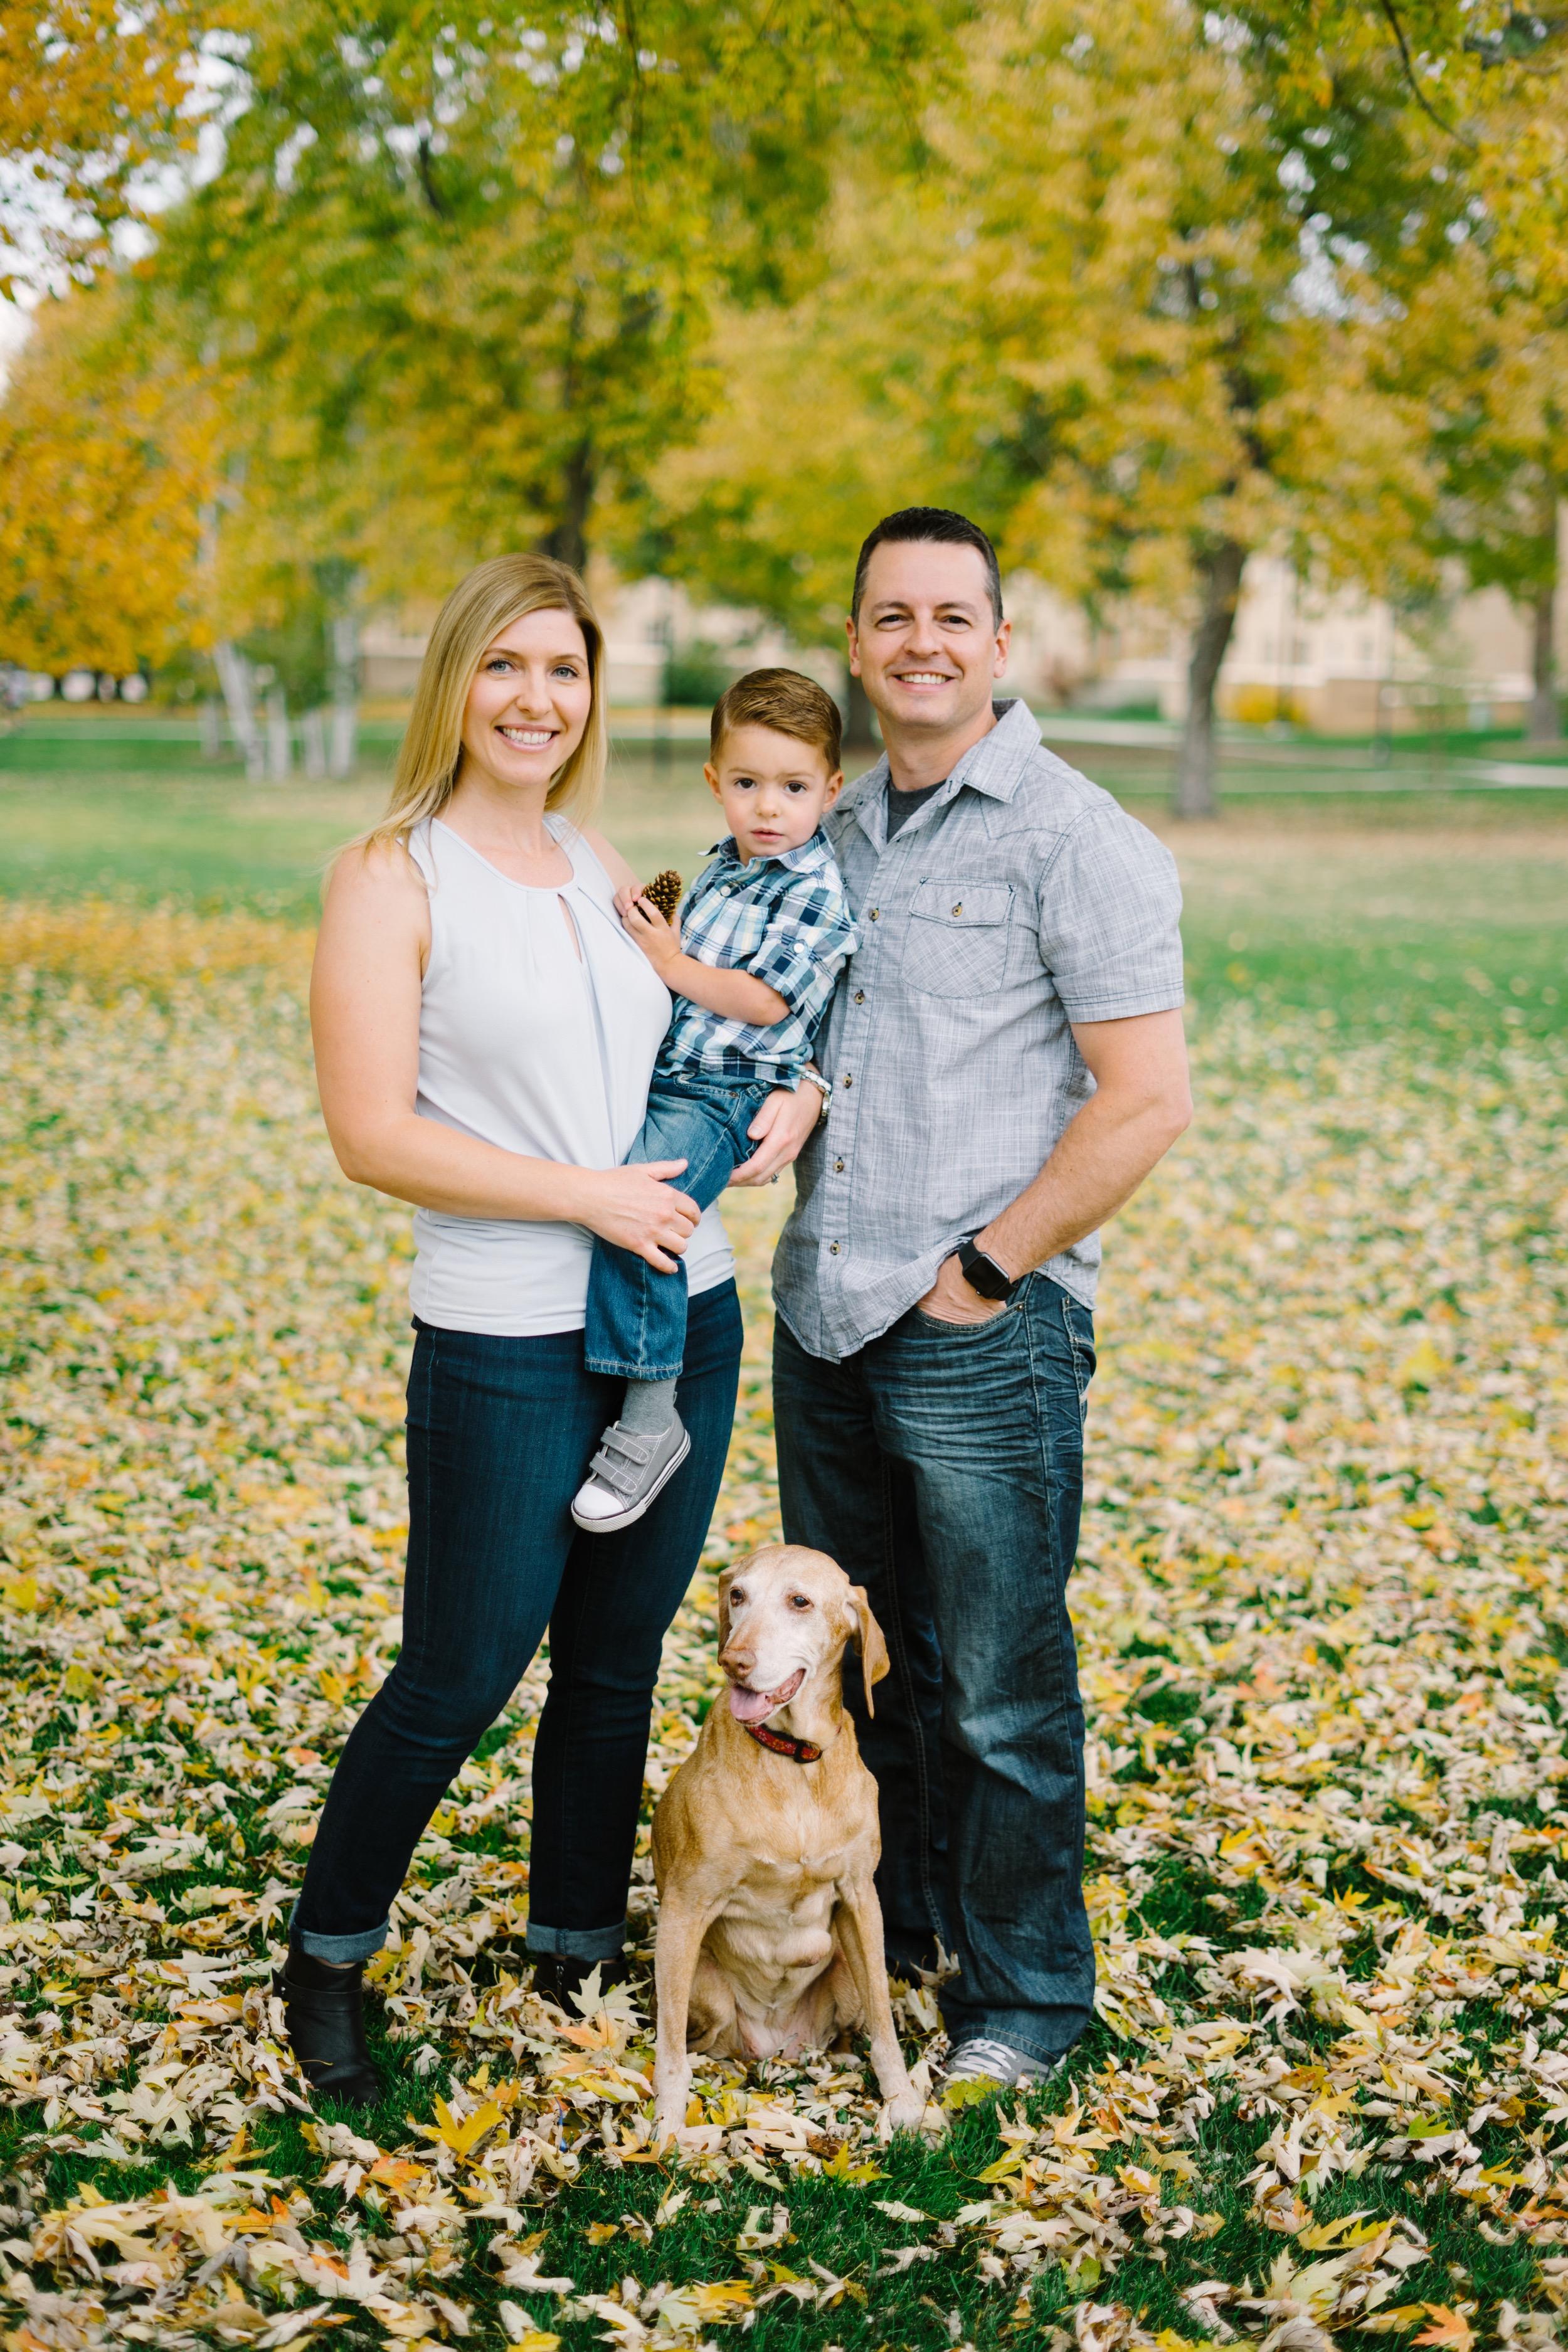 Denver Family Photography Dr. Bates - 1.jpg